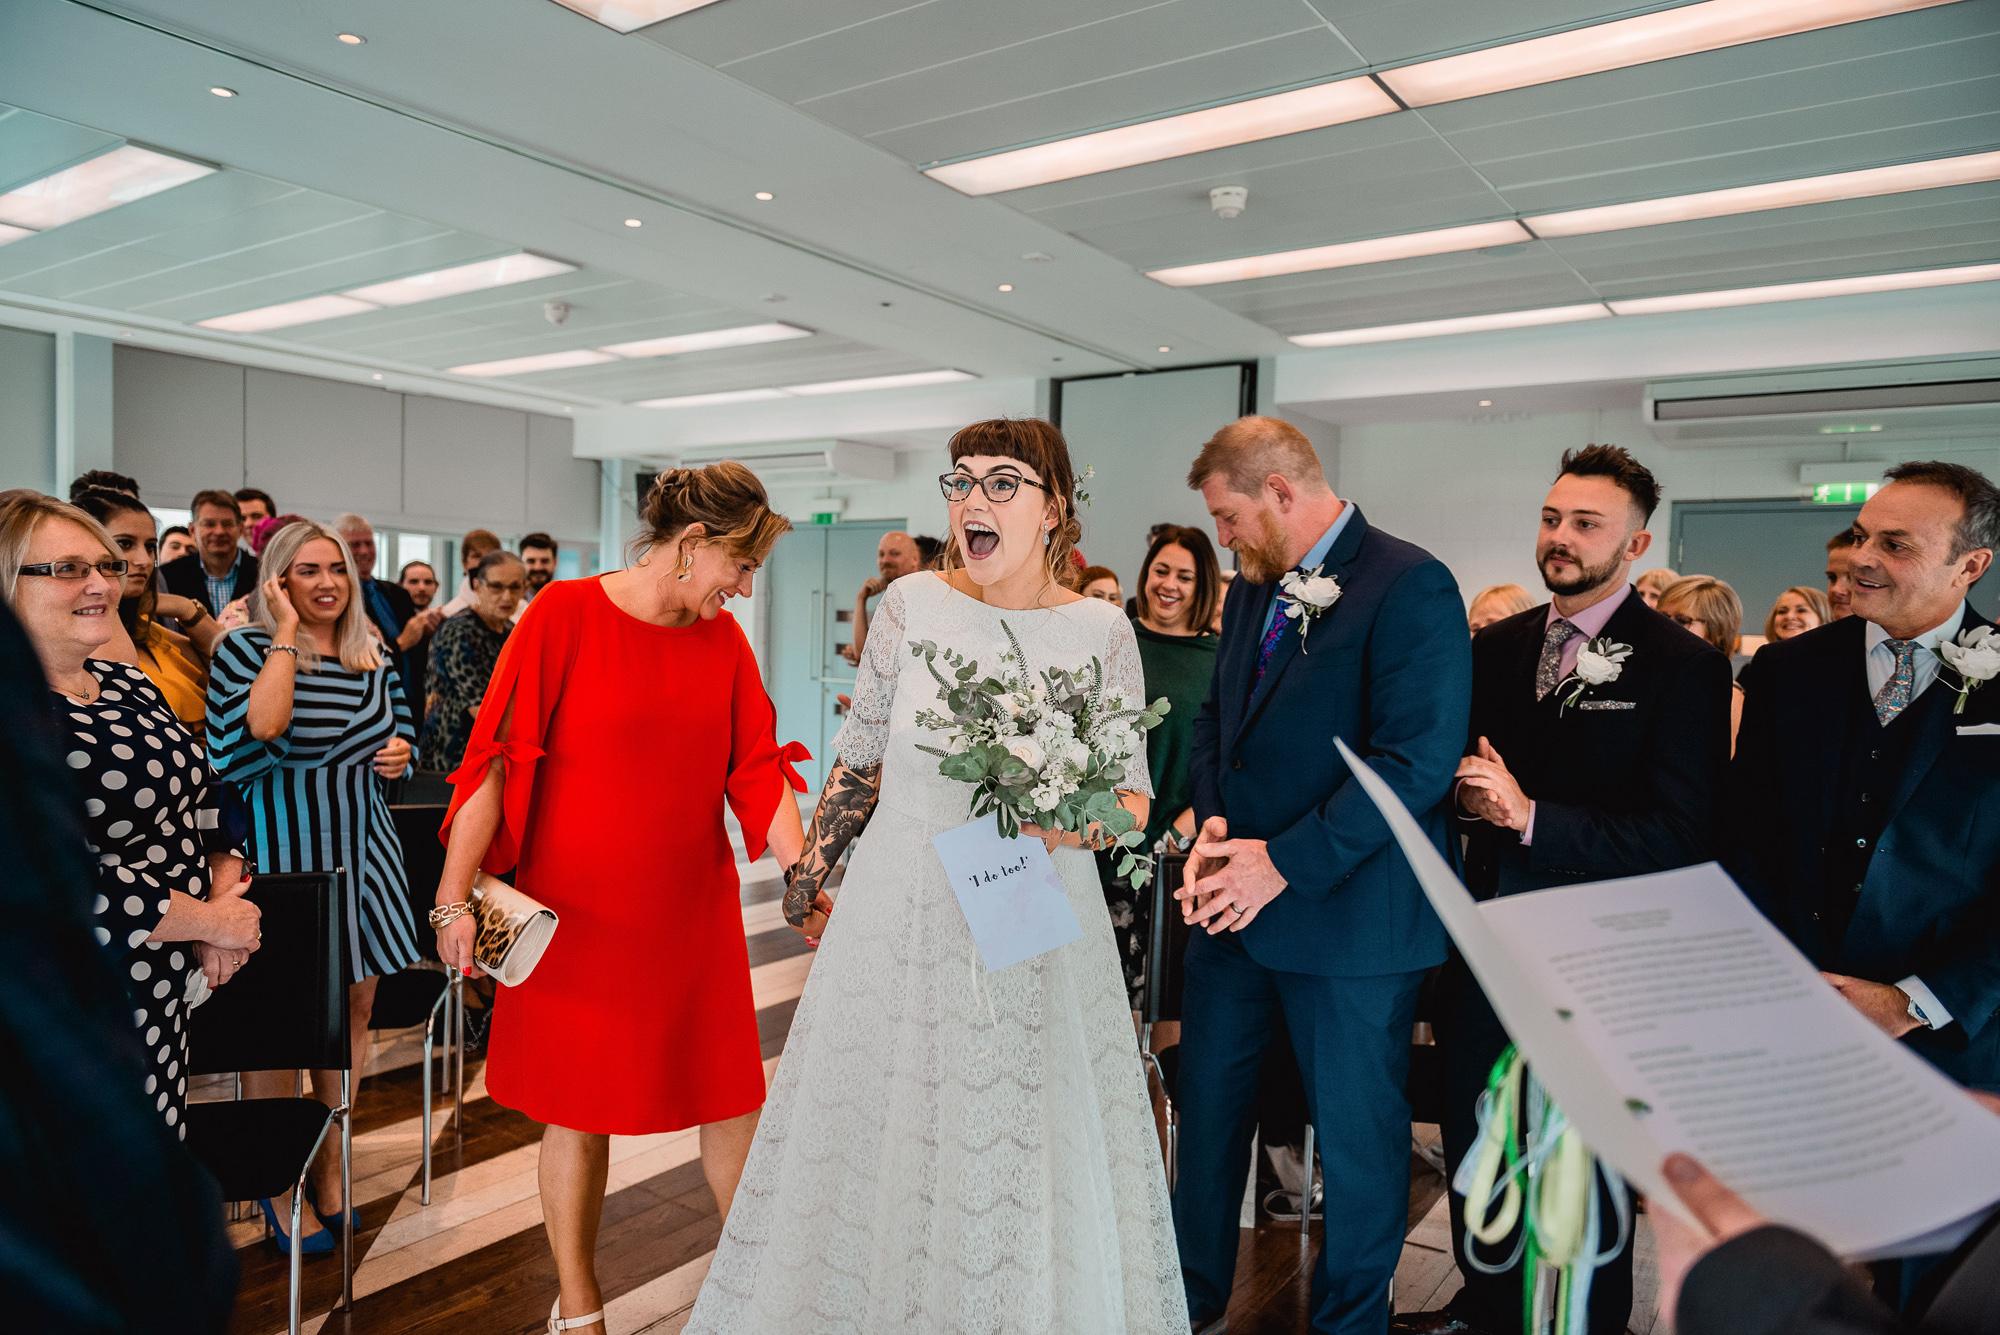 Harriet-Dahlia-Bespoke-Lace-Silk-Bohemian-Wedding-Dress-Sleeves-Tattooed-Bride-Alternative-Wedding-Sheffield-3.jpg